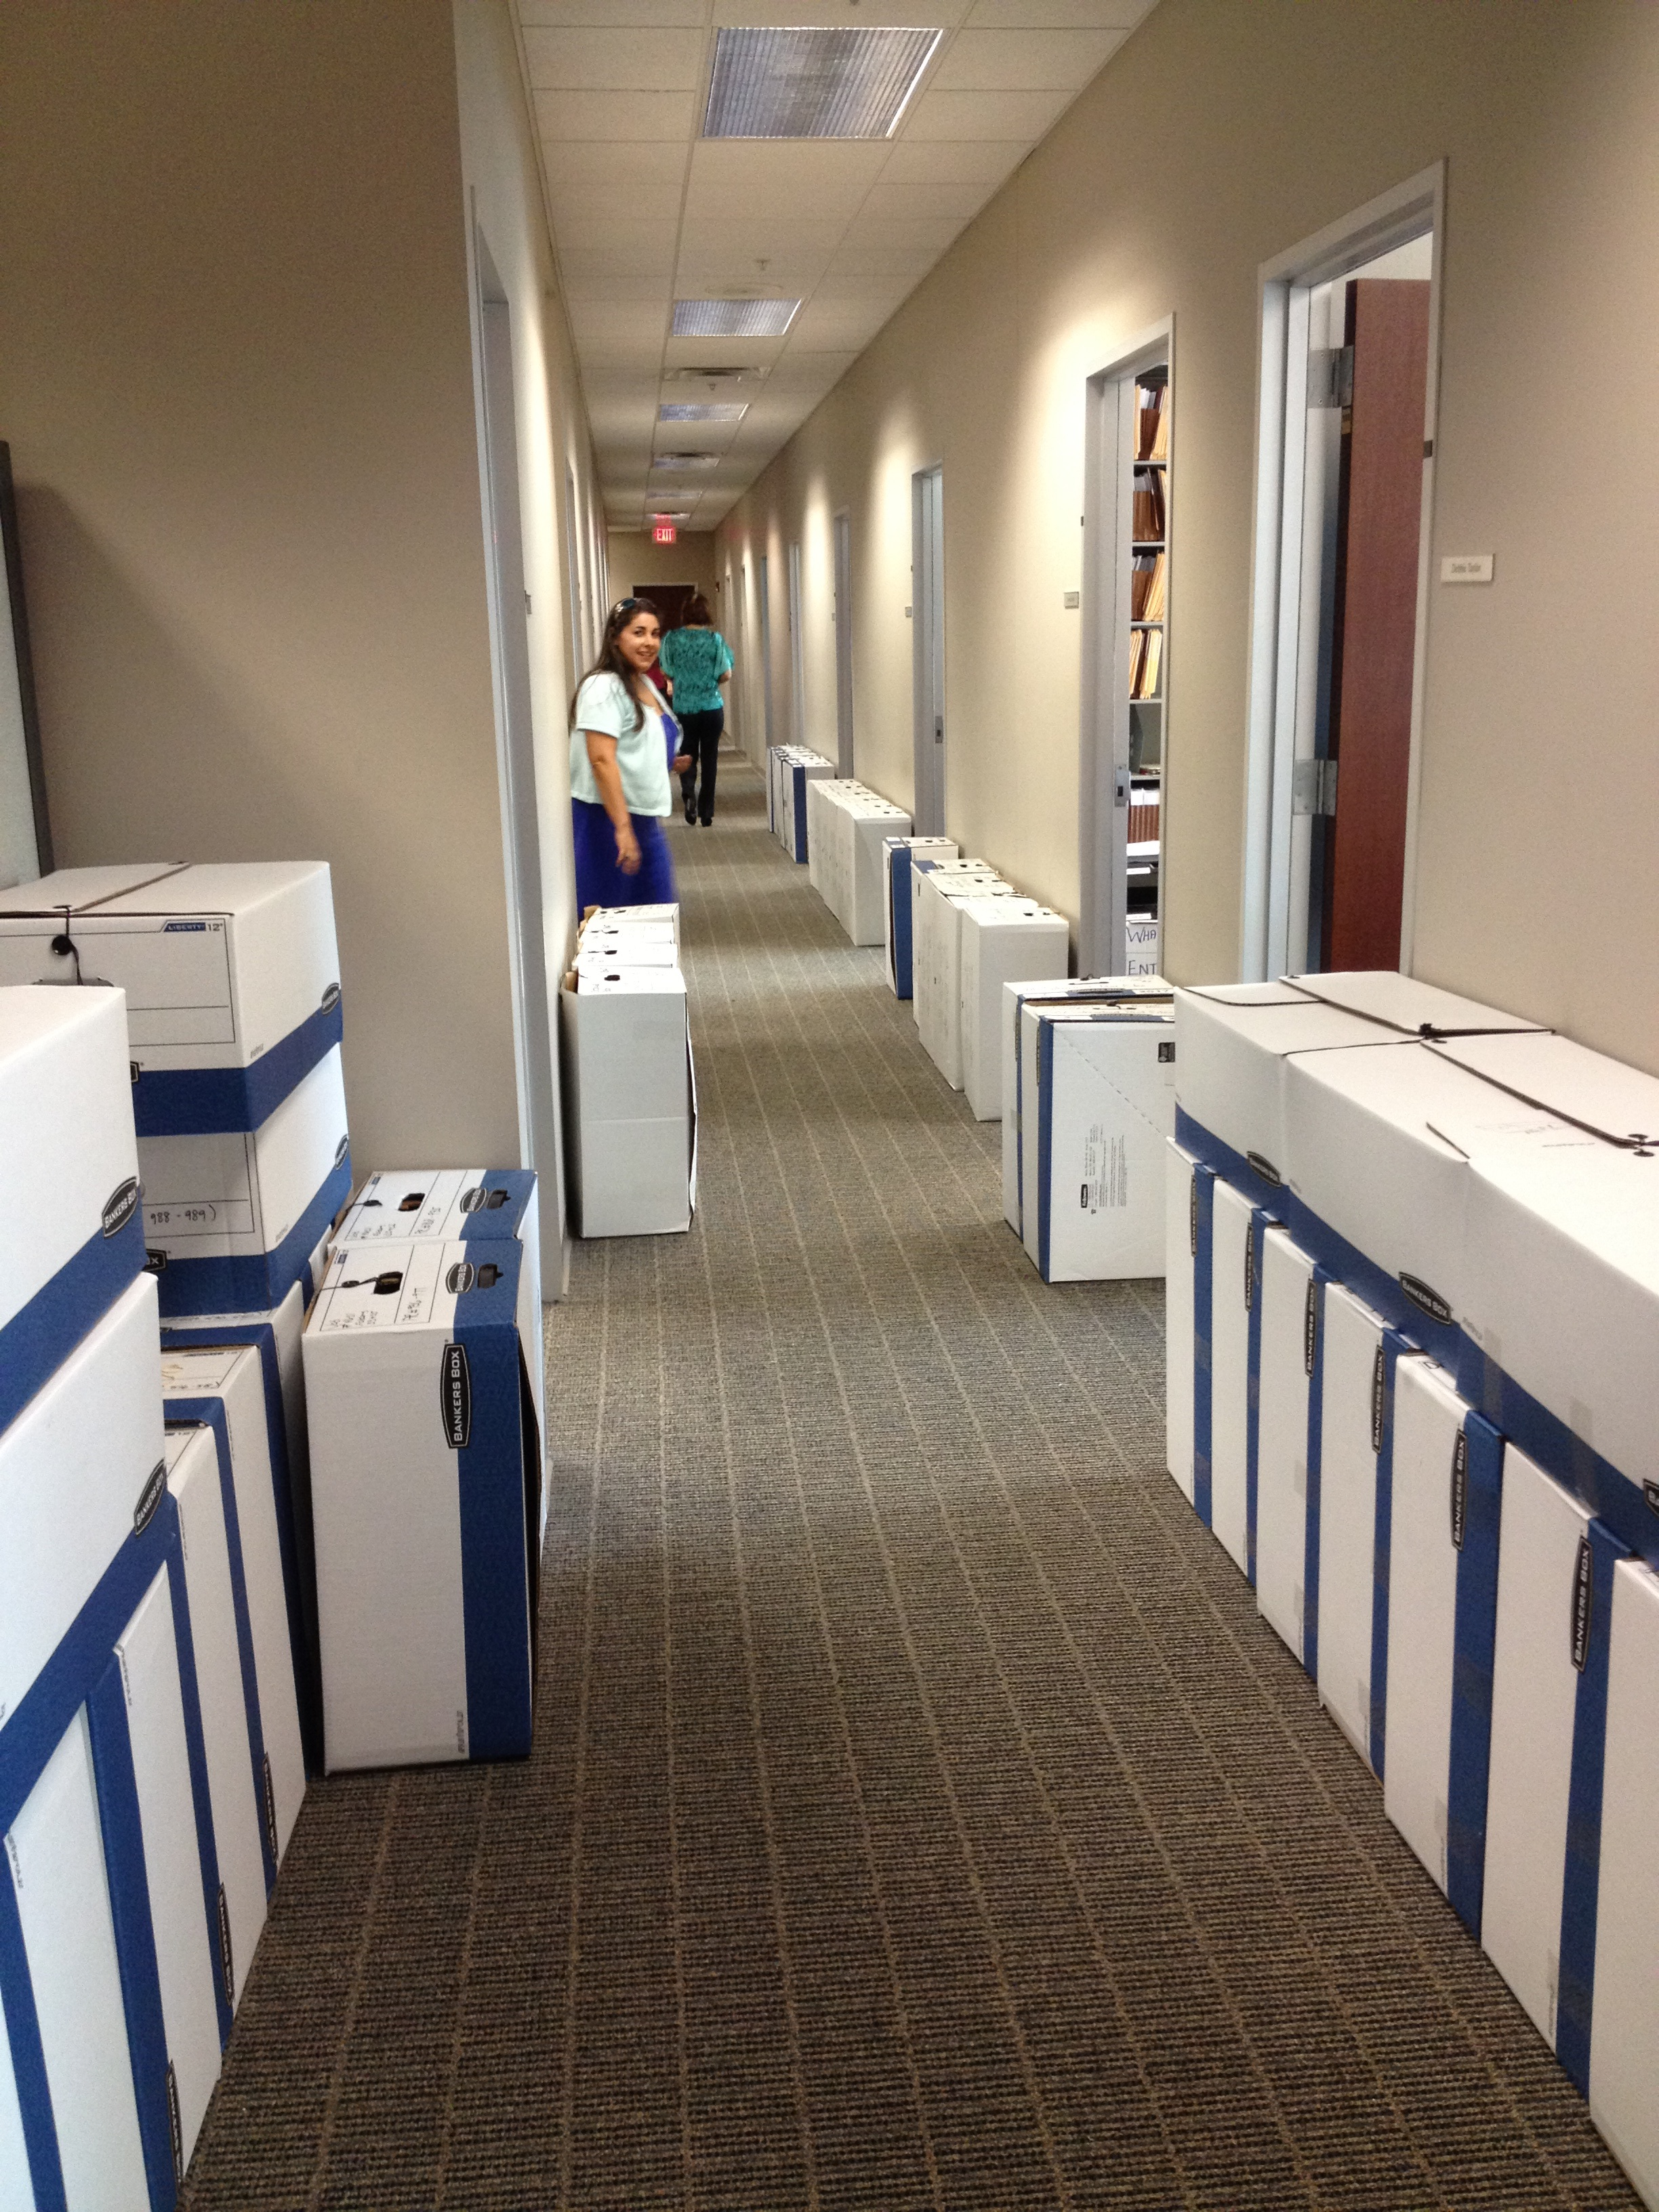 Files in hallway